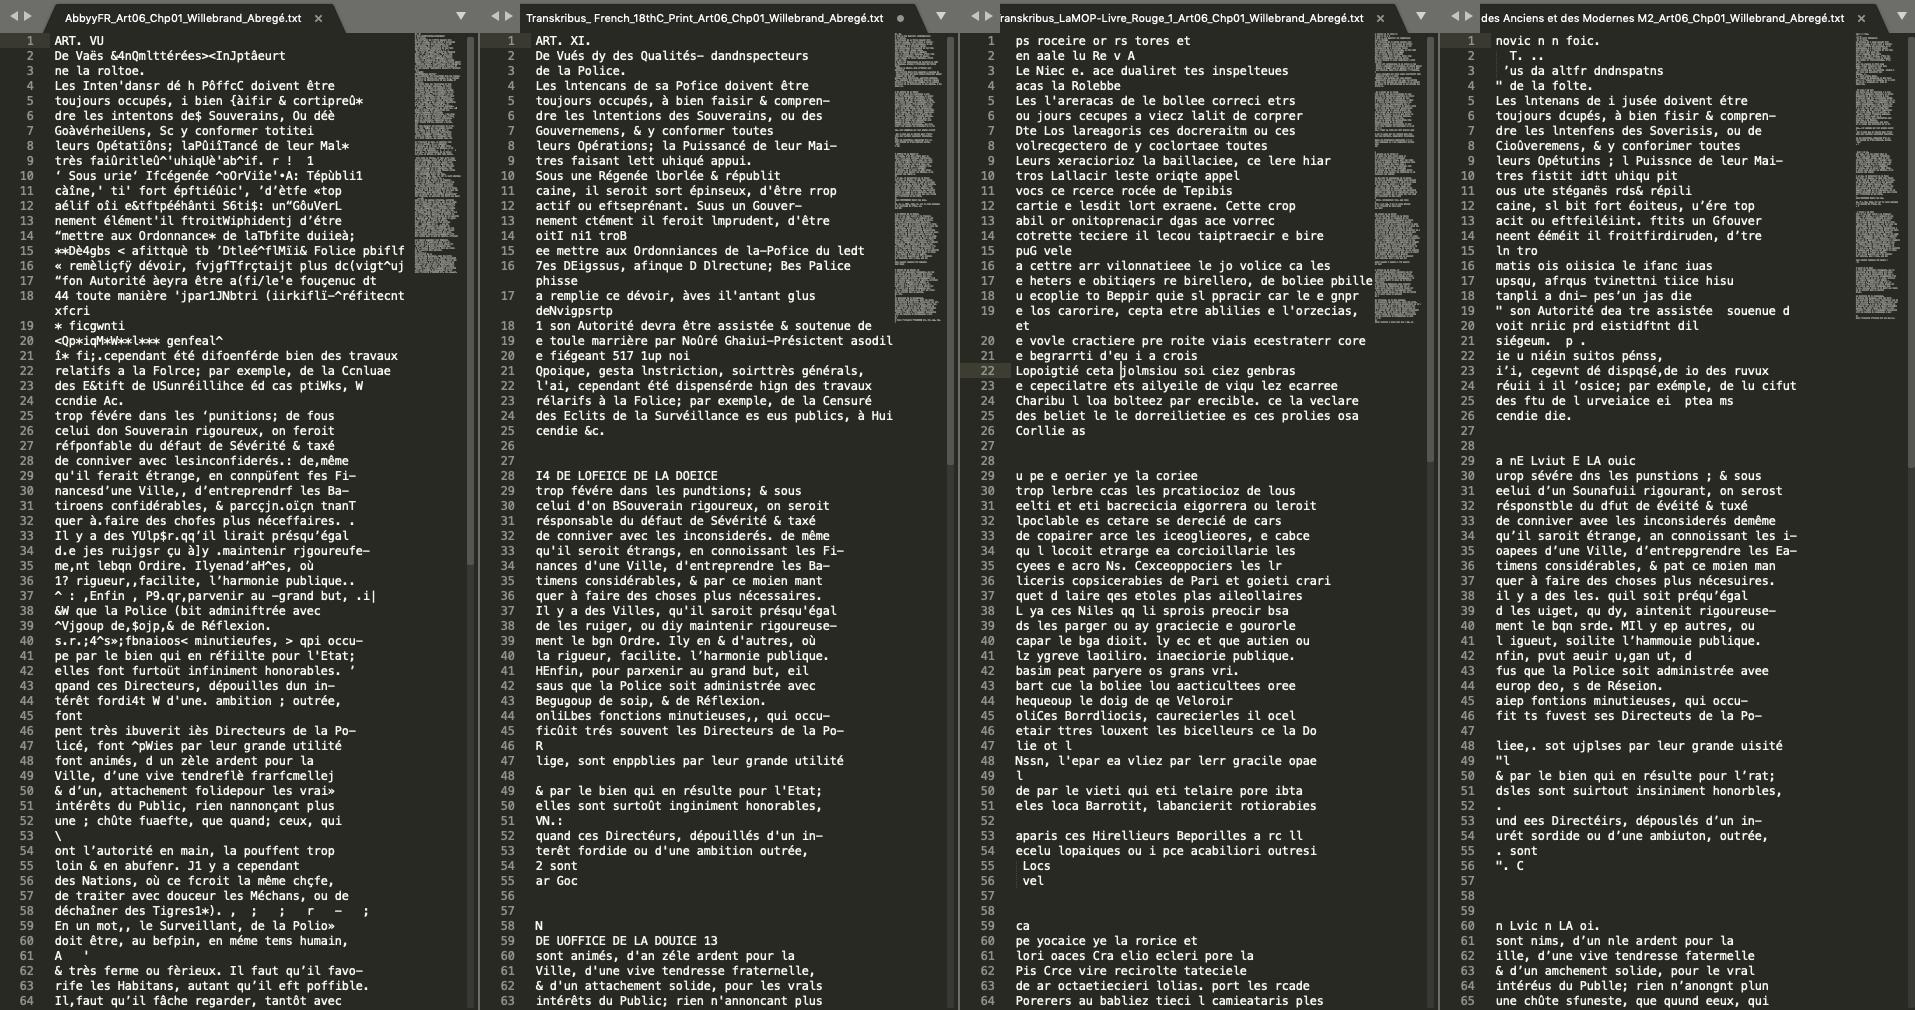 Comparison of OCR tools: 1) Abbyy FineReader (modern French), 2) Transkribus model French_18thC_Print, 3) Transkribus model LaMOP-Livre_Rouge_1, 4) Transkribus model Parallèle des Anciens et des Modernes M2